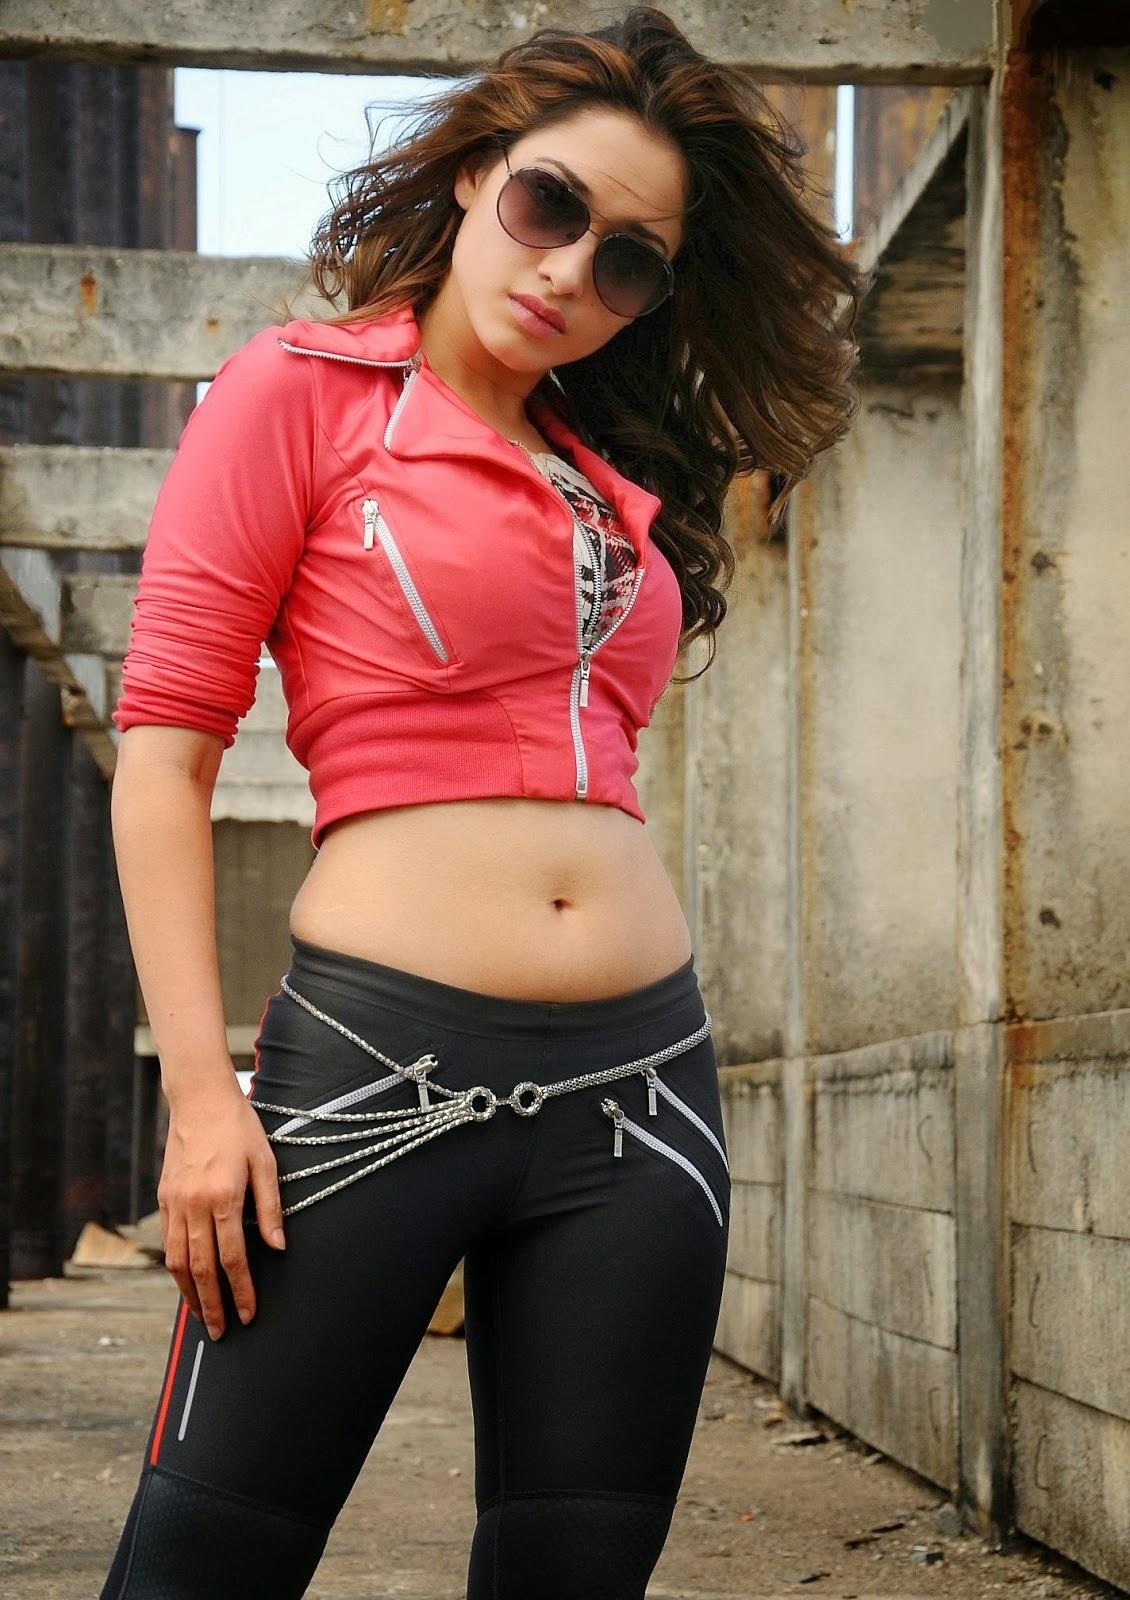 Milky beautiful Tamanna latest hot photos in rebel telugu movie